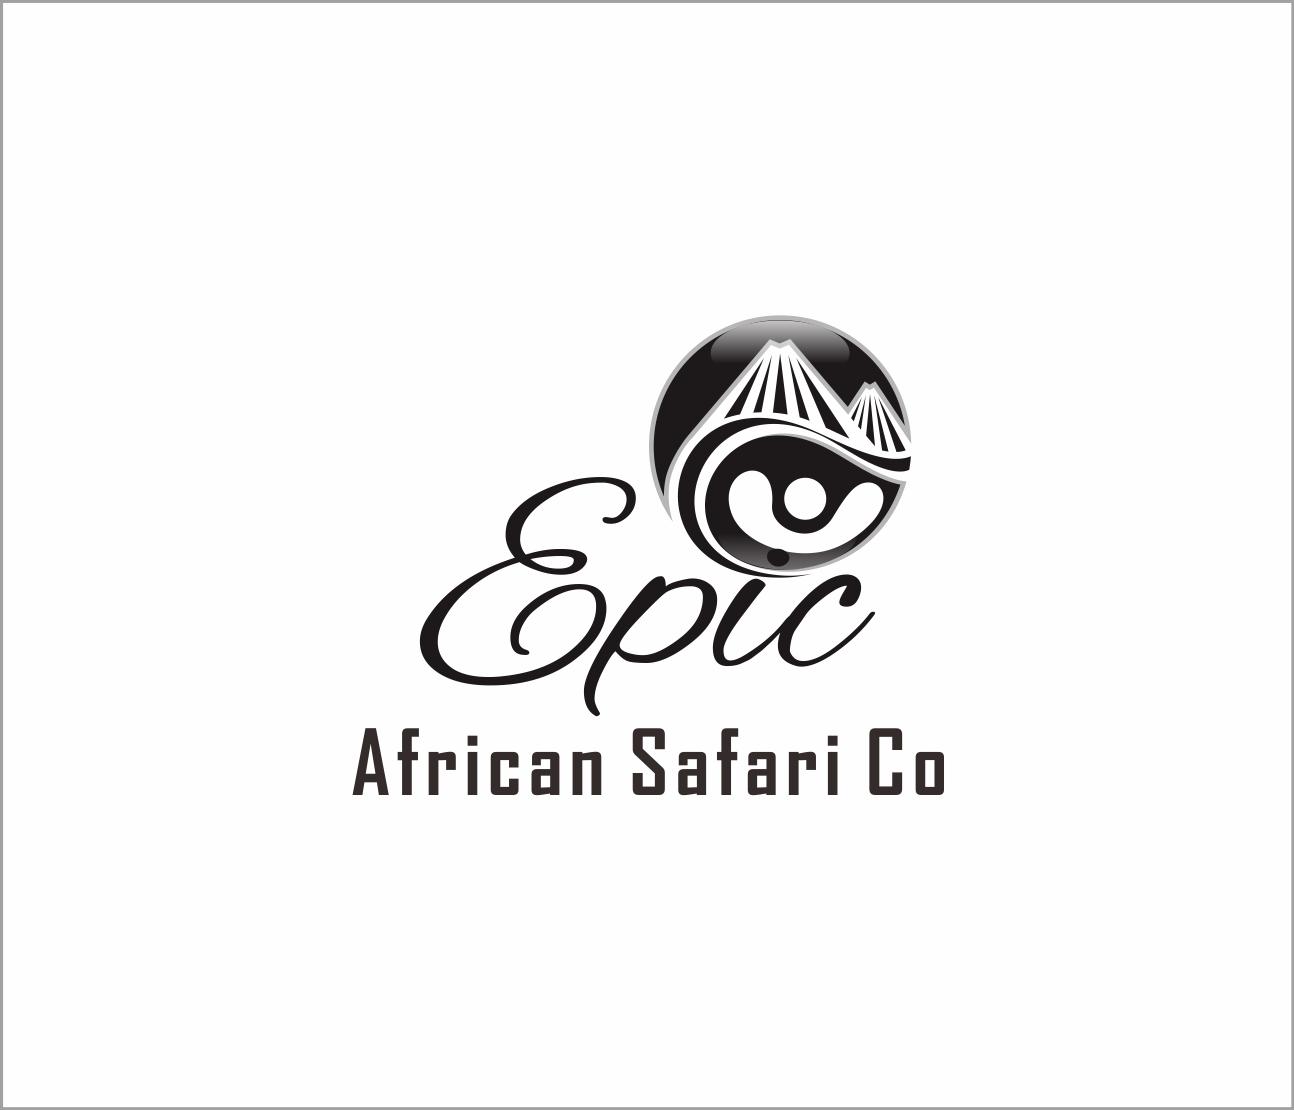 Logo Design by Armada Jamaluddin - Entry No. 49 in the Logo Design Contest Epic logo design.